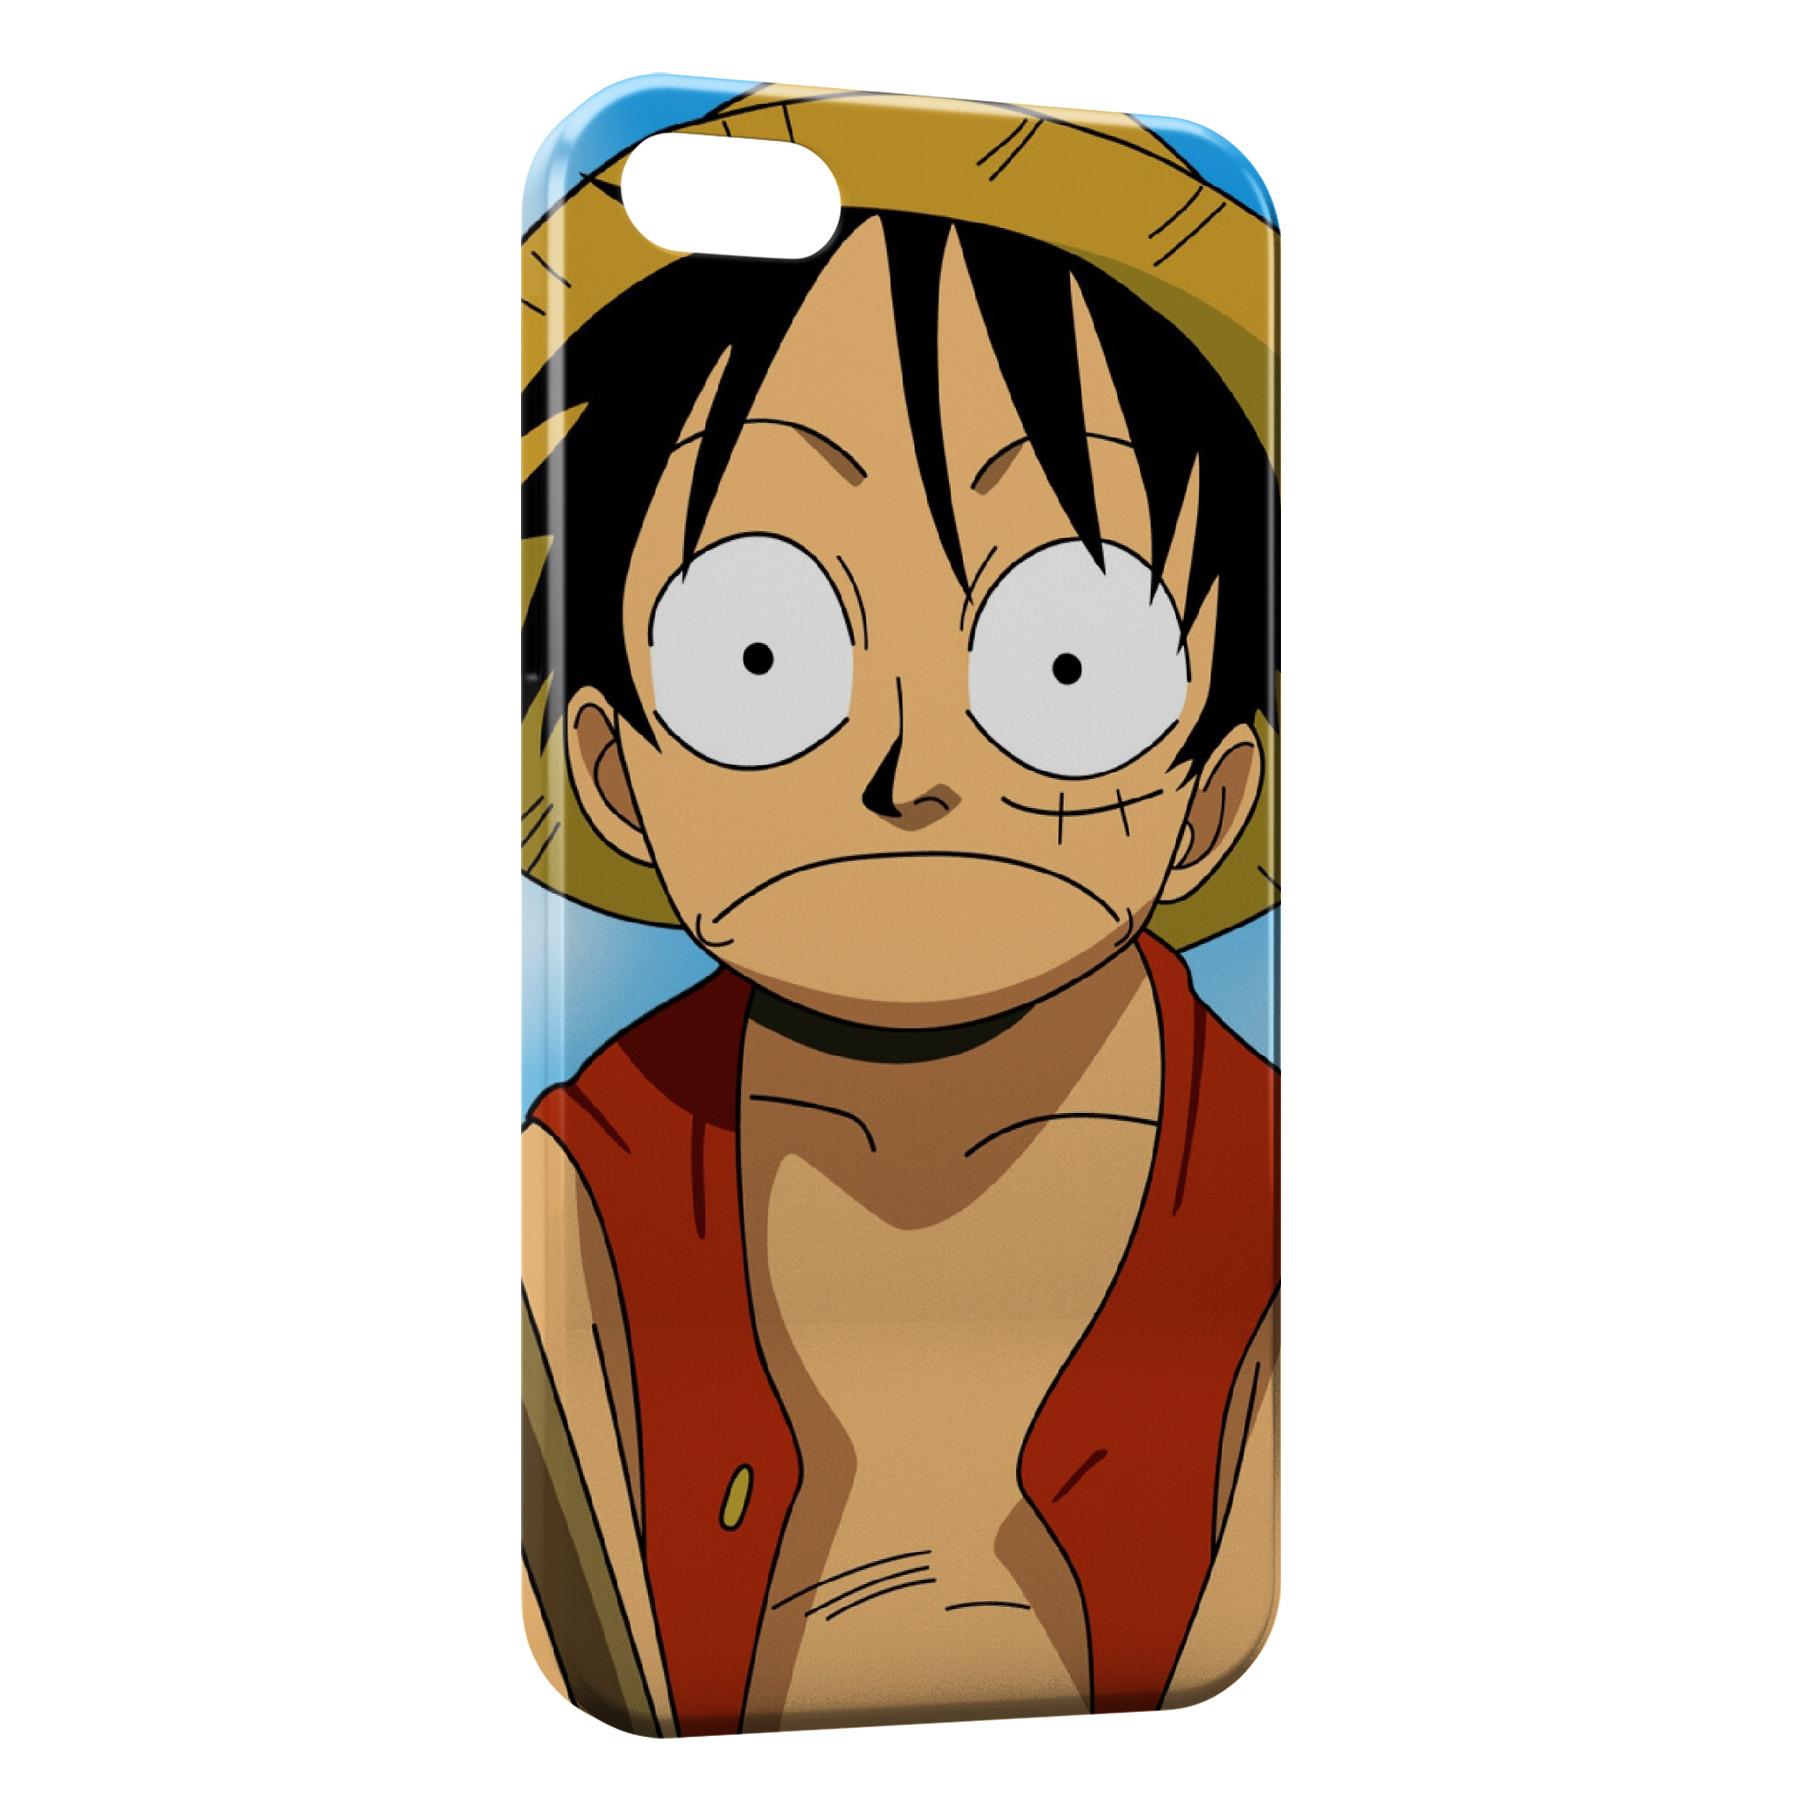 iphone 6 coque one piece